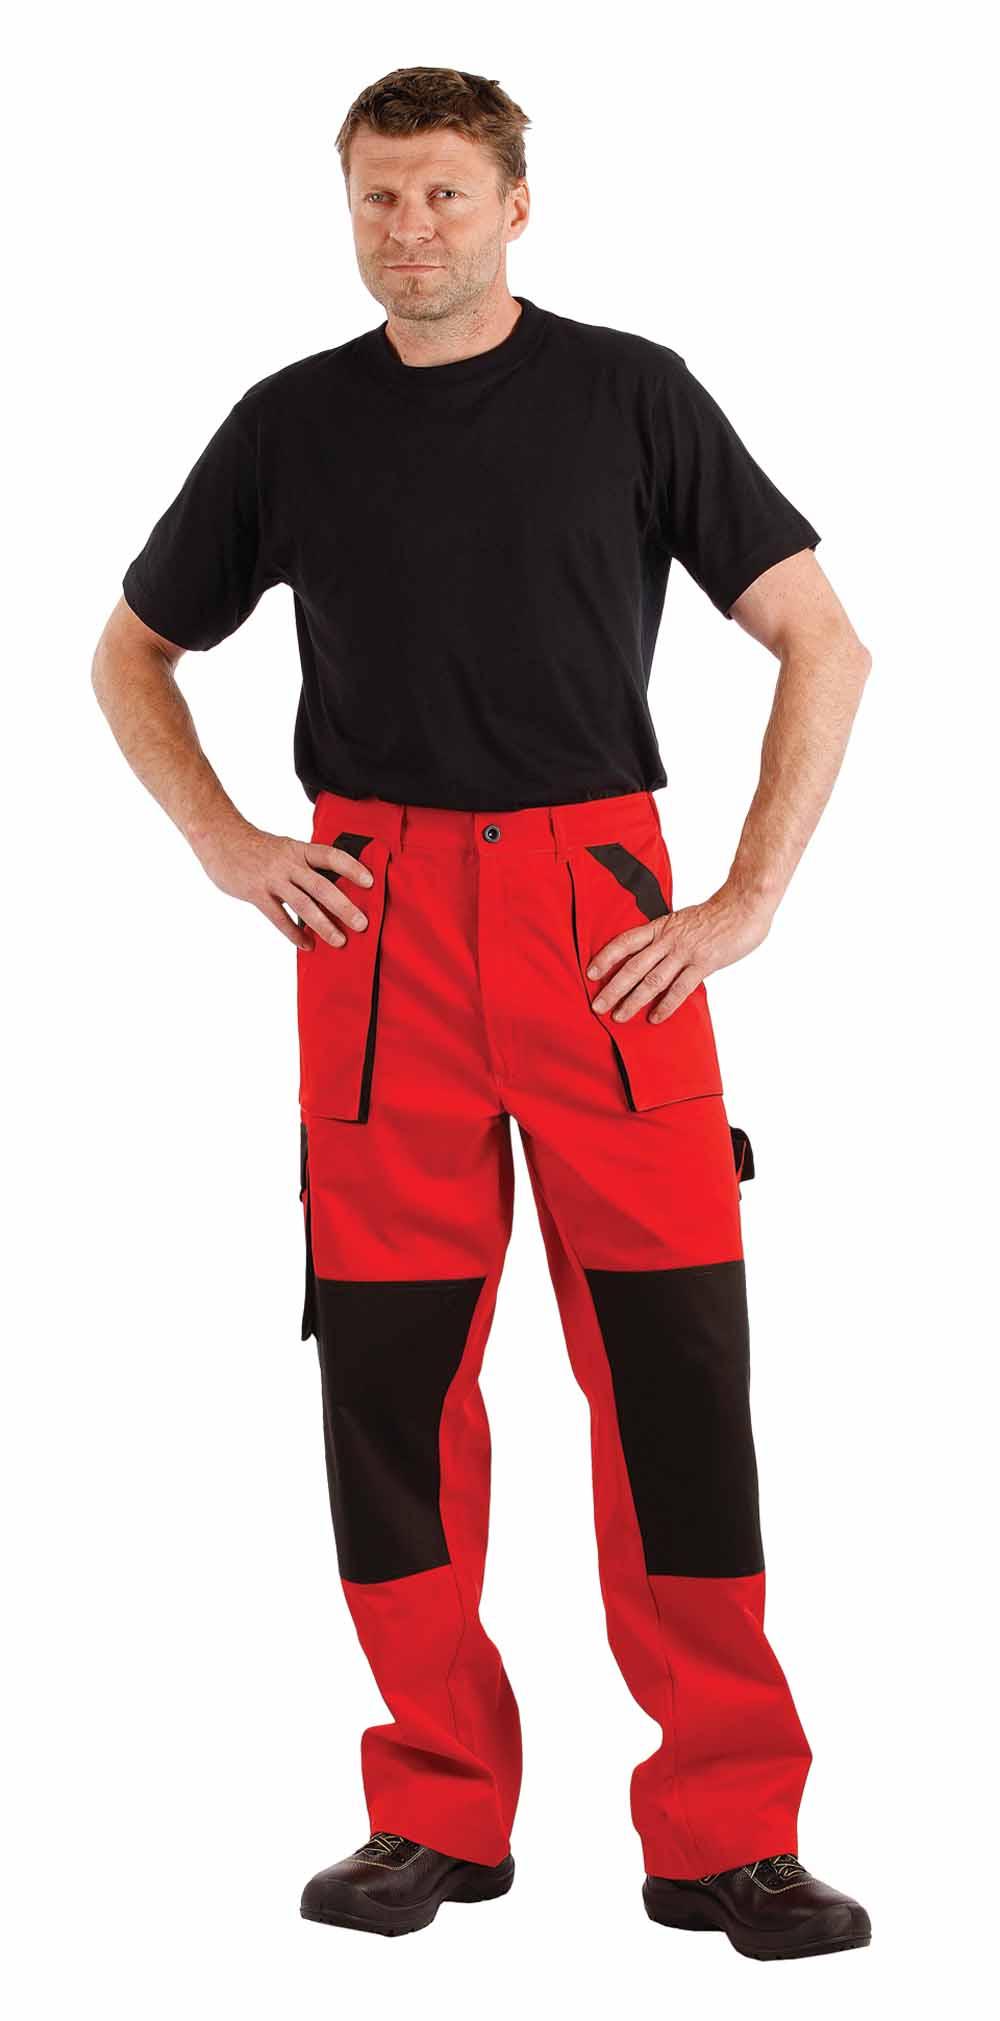 MAX nadrág piros-fekete